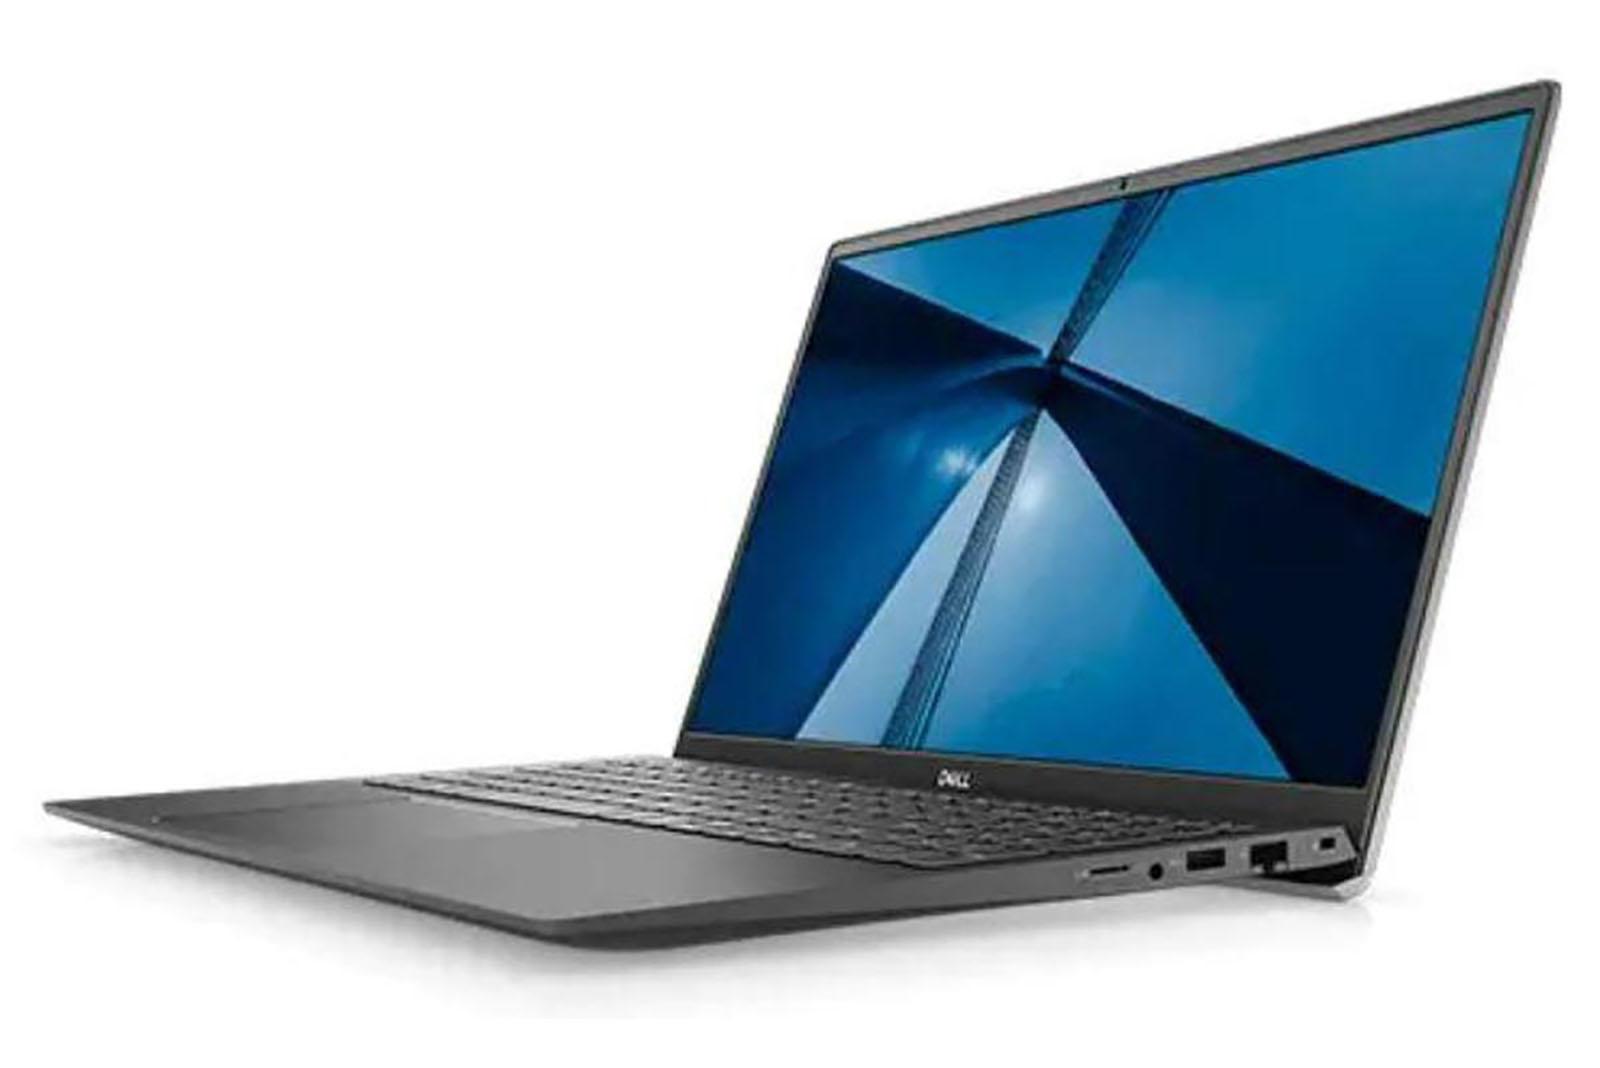 black-friday-2020-dell-vostro-15-5502-business-laptop-notebook-deal-sale.jpg